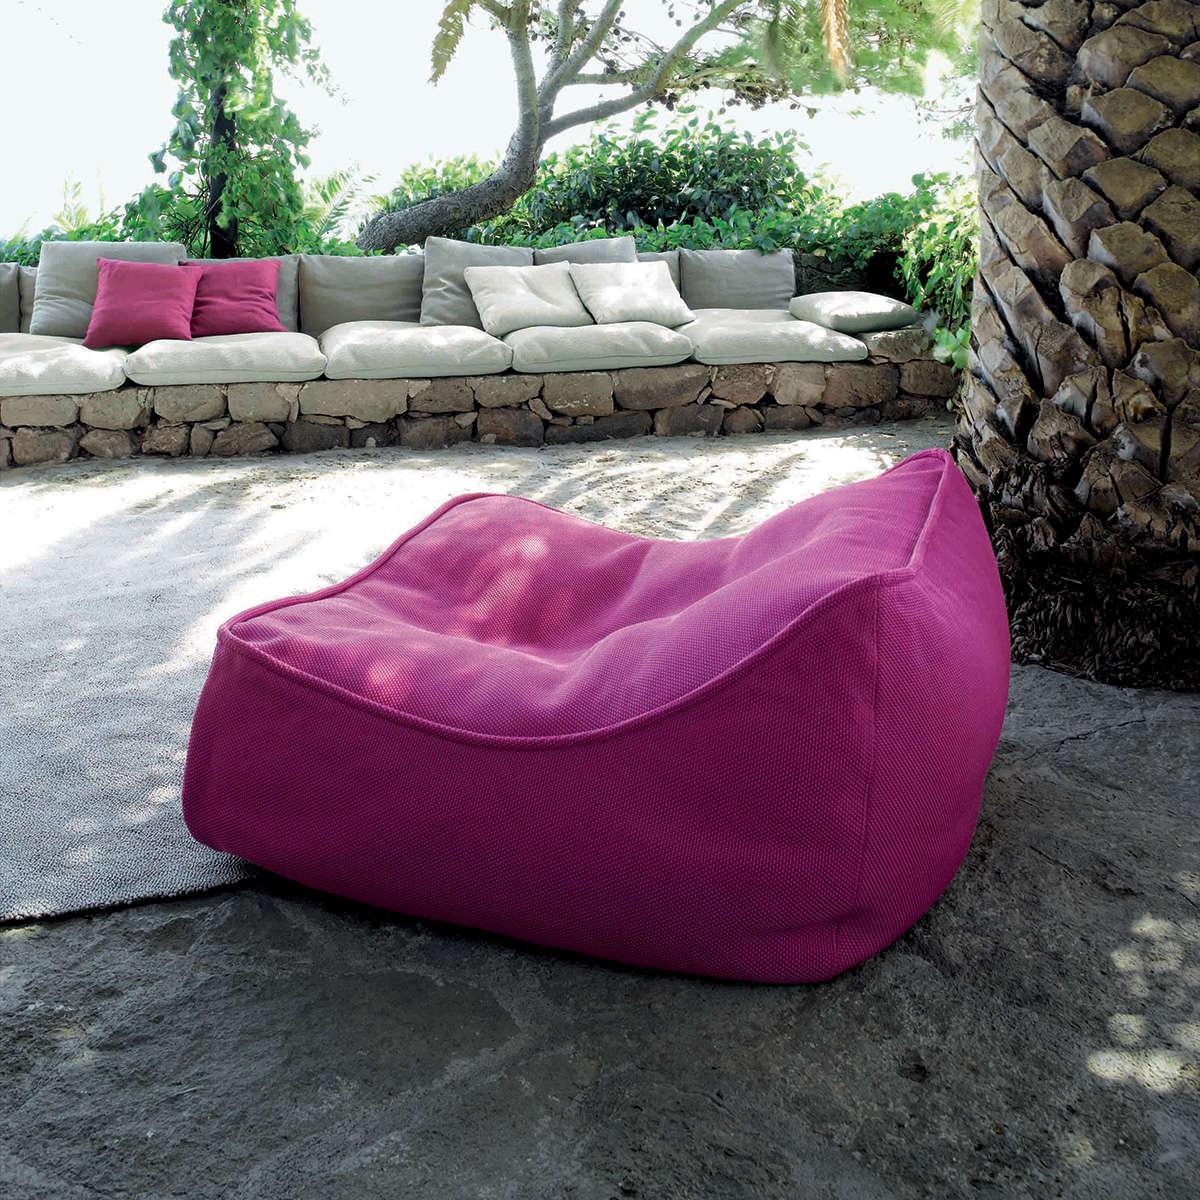 Float Paola Lenti Lounge Chair 1